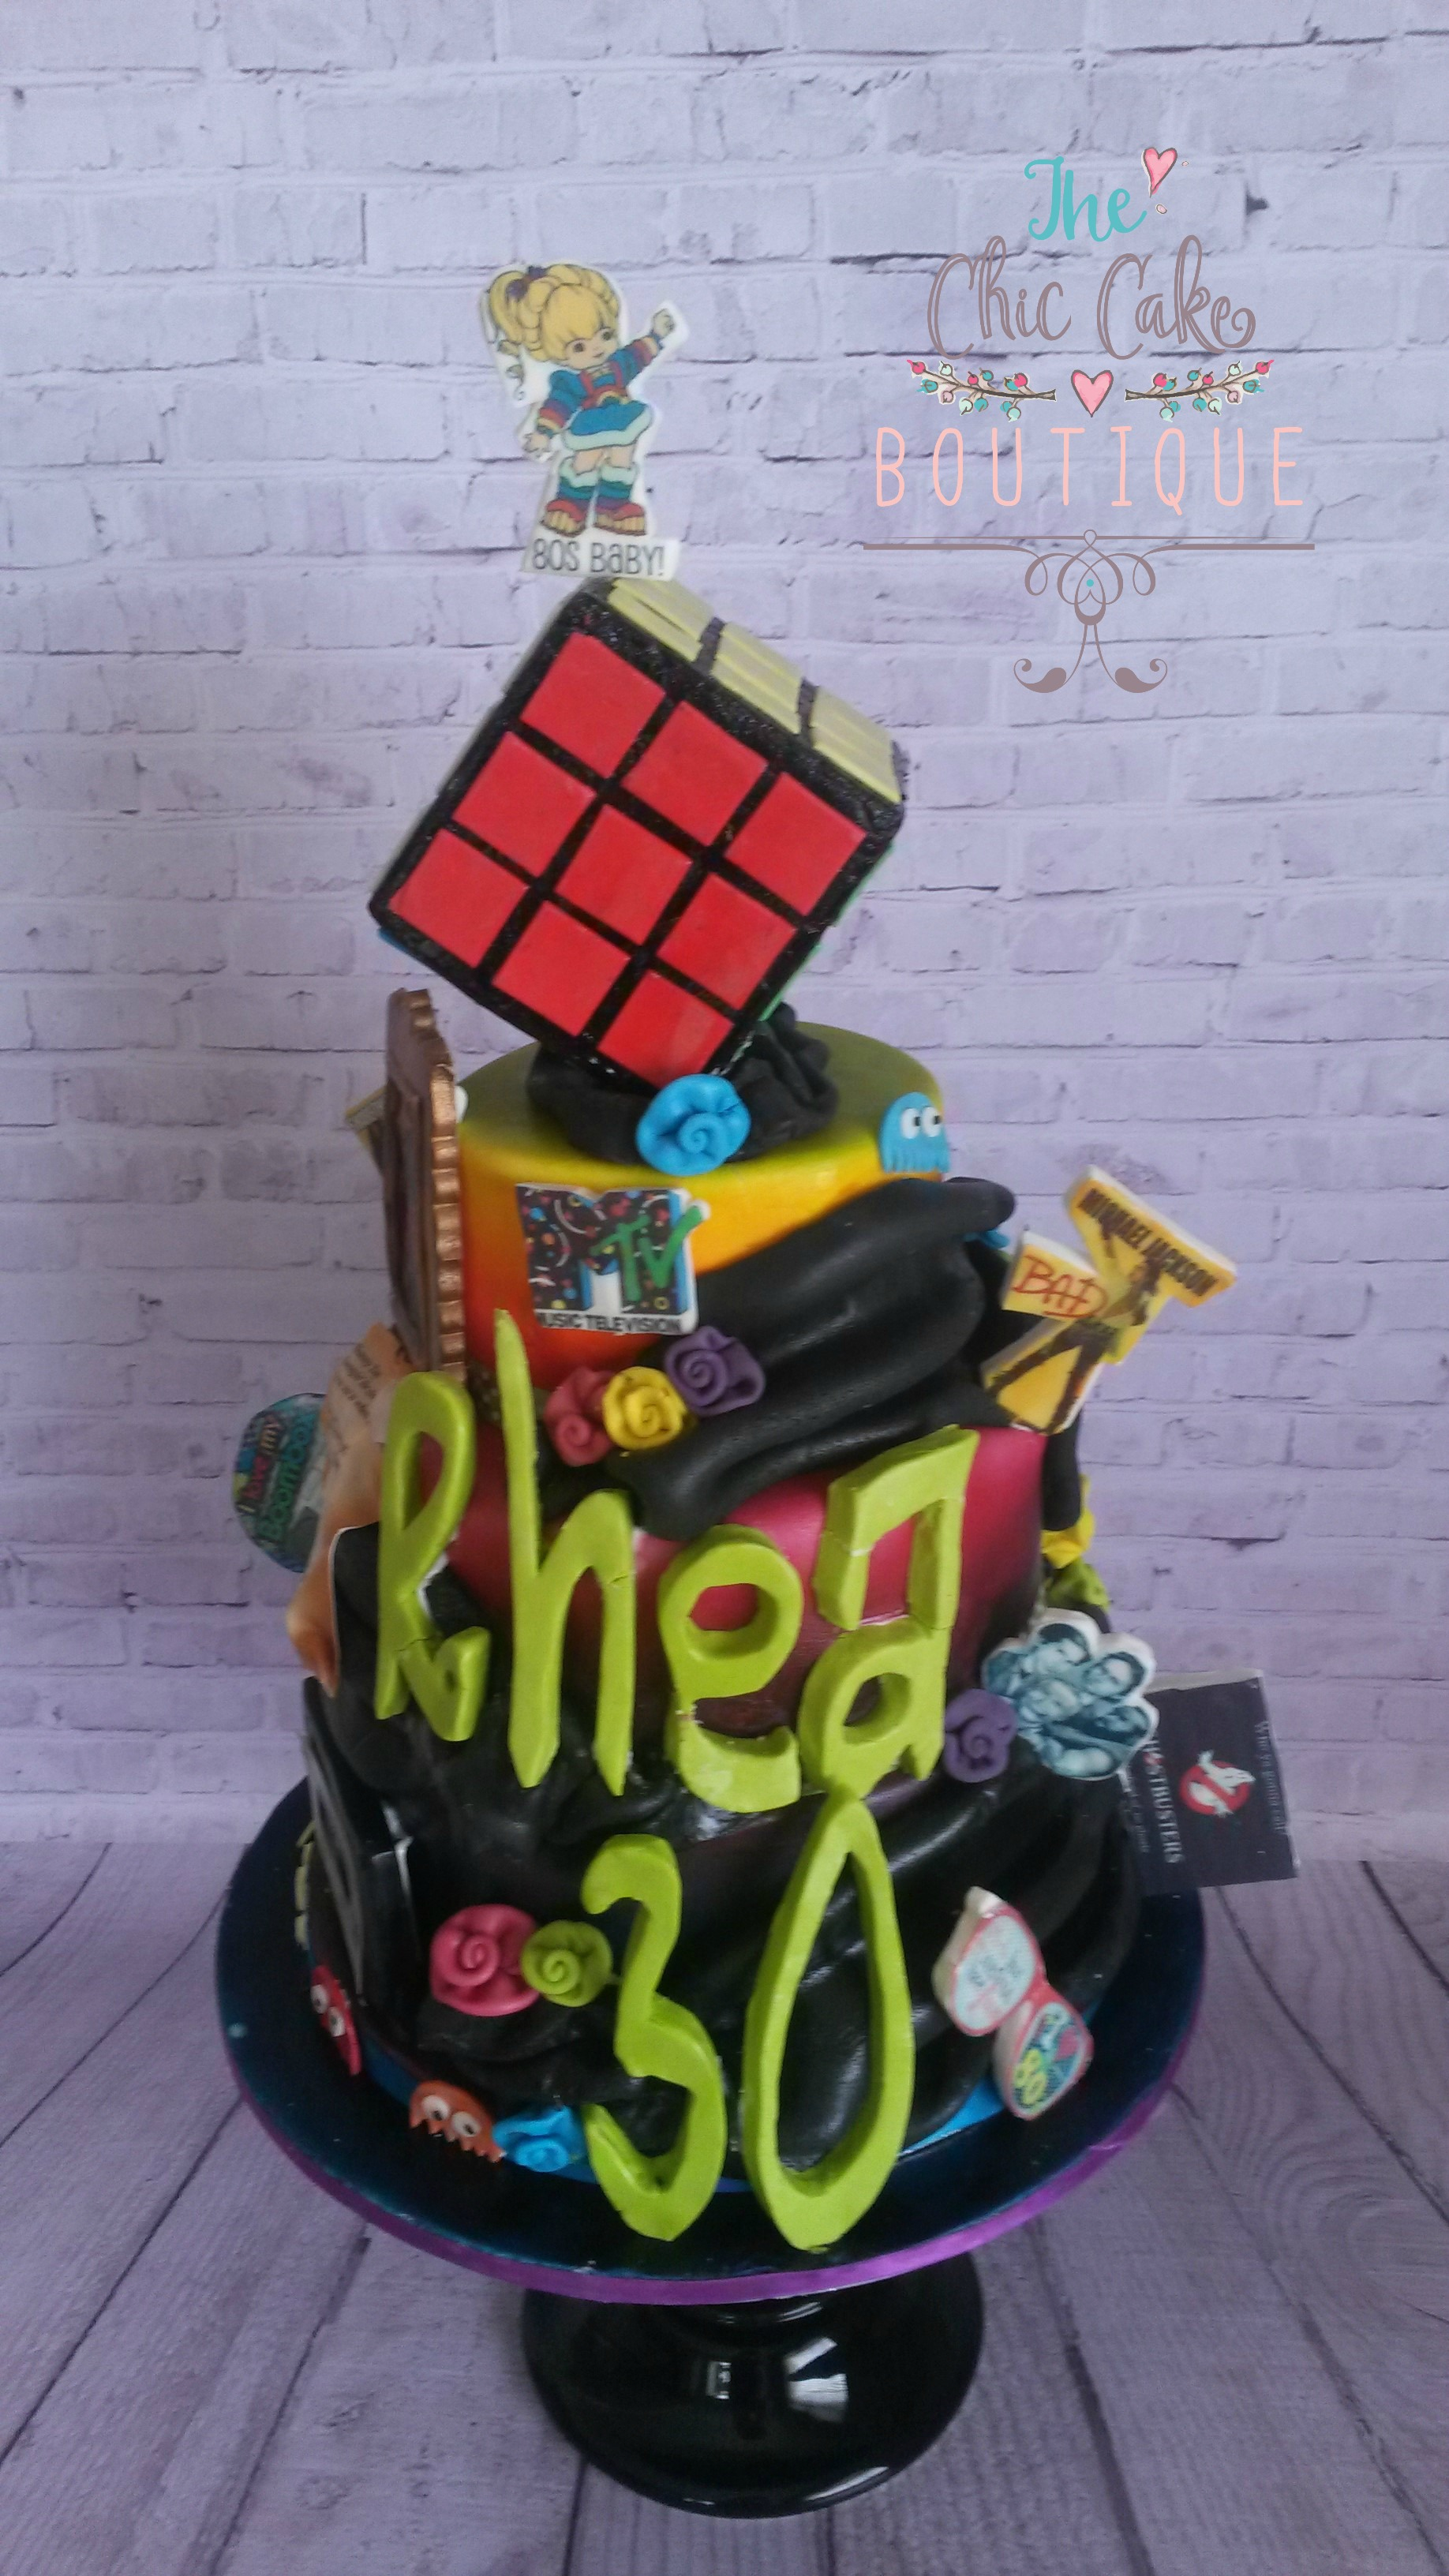 rhea-cake-022-with-logo